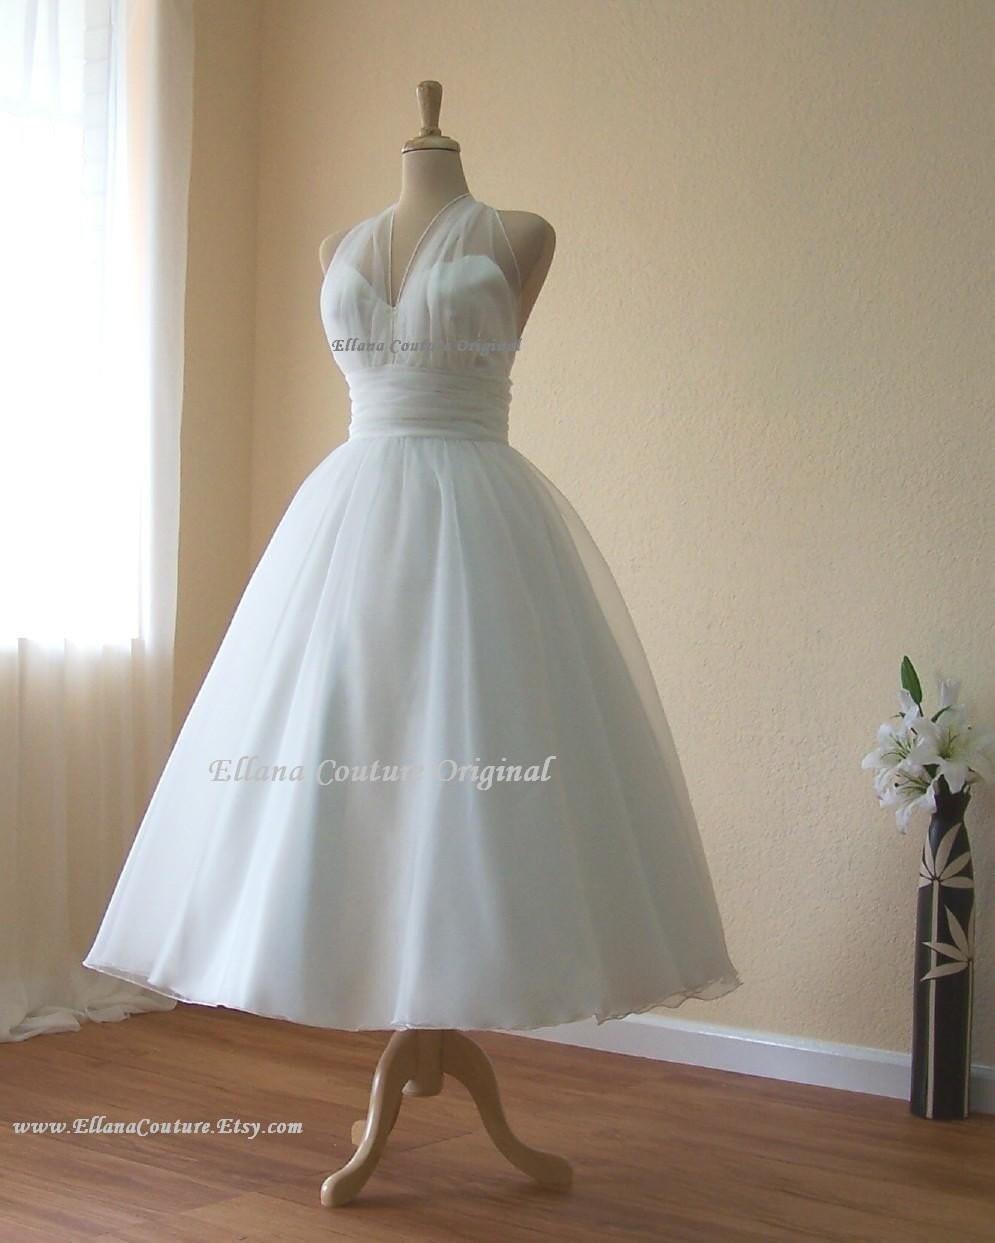 retro style wedding dresses retro wedding dress retro style wedding dresses